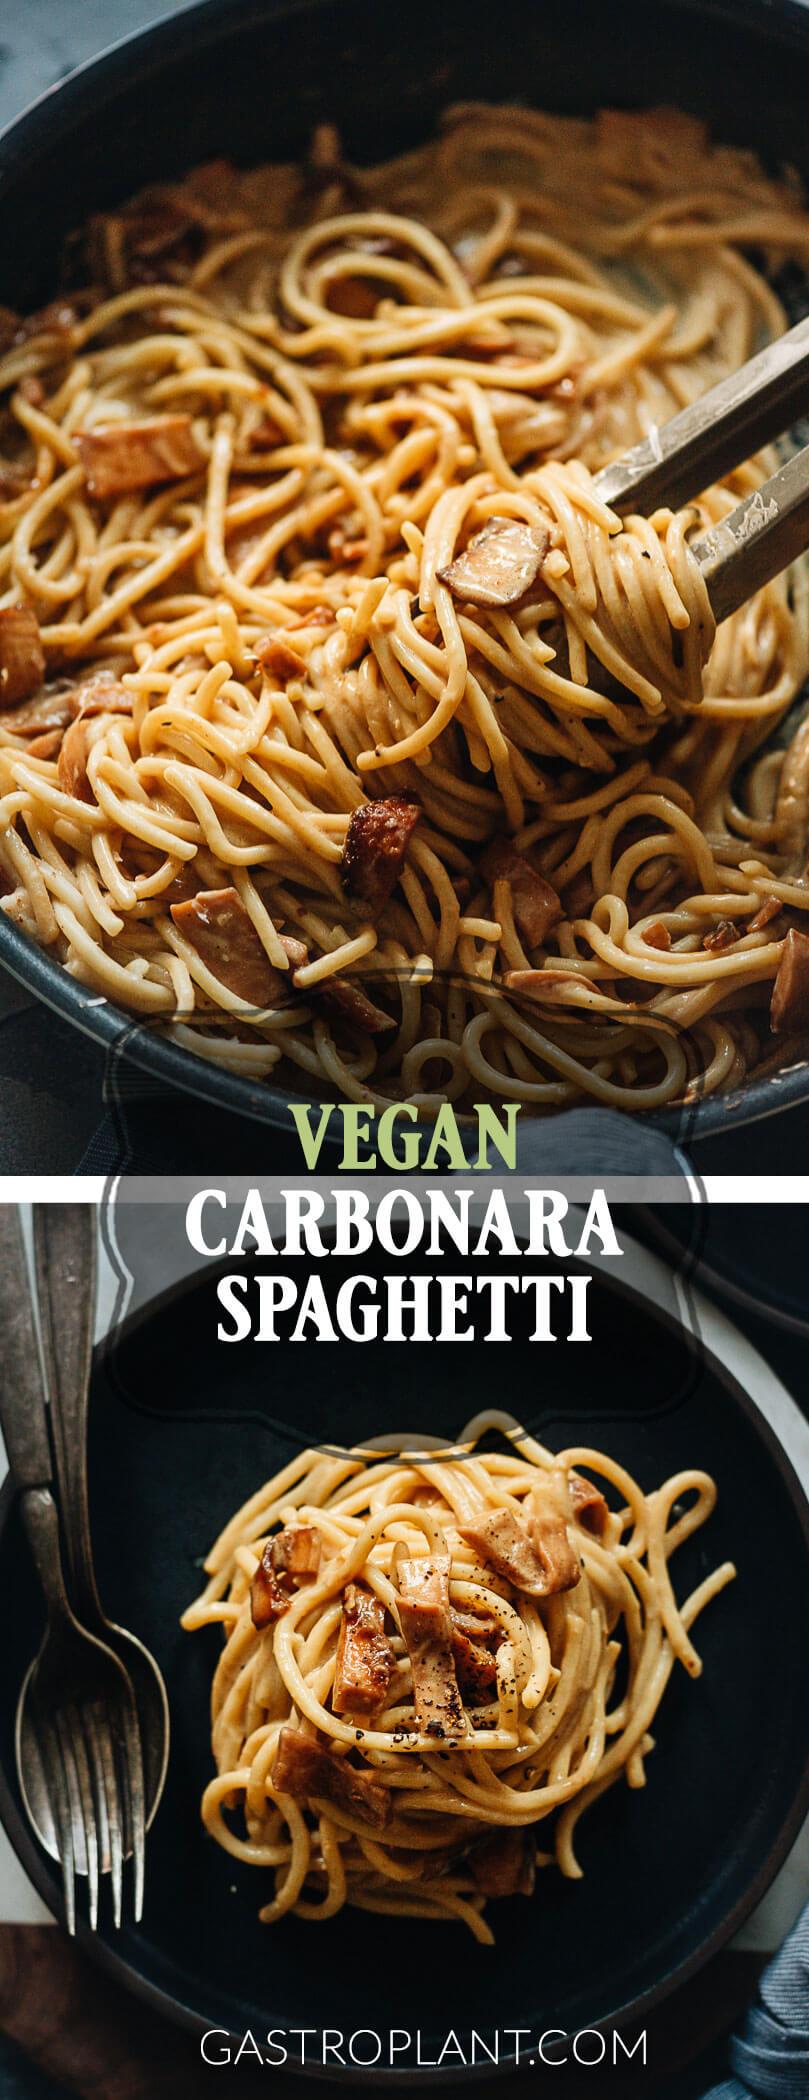 Easy Vegan Carbonara Spaghetti with King Oyster Mushroom Bacon